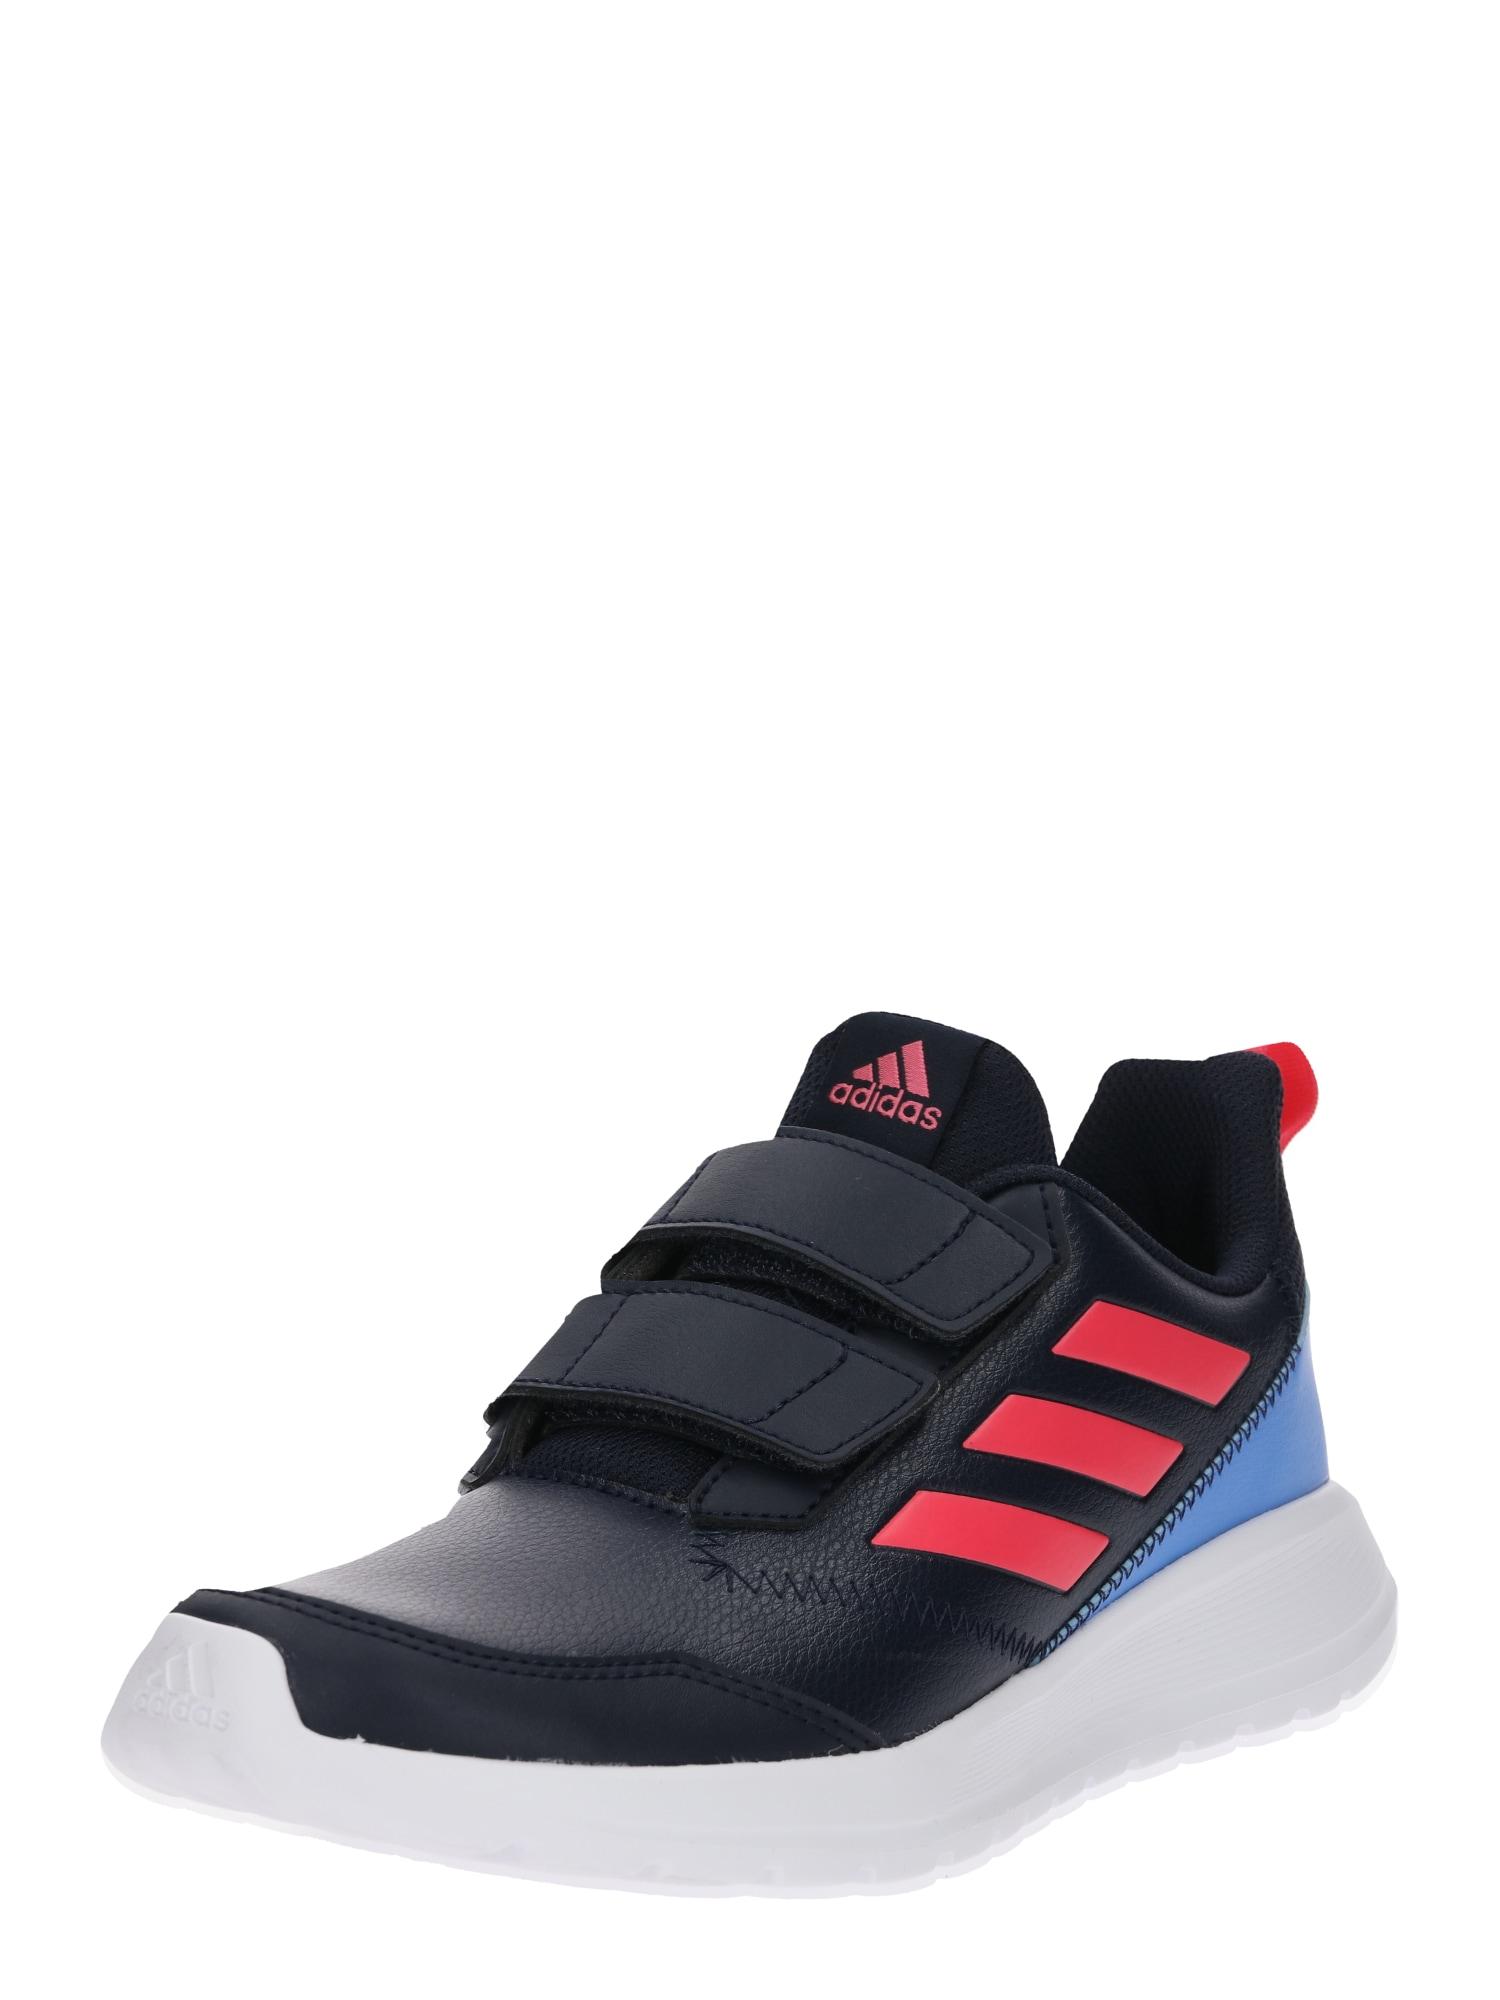 Tenisky AltaRun modrá svítivě červená černá ADIDAS PERFORMANCE